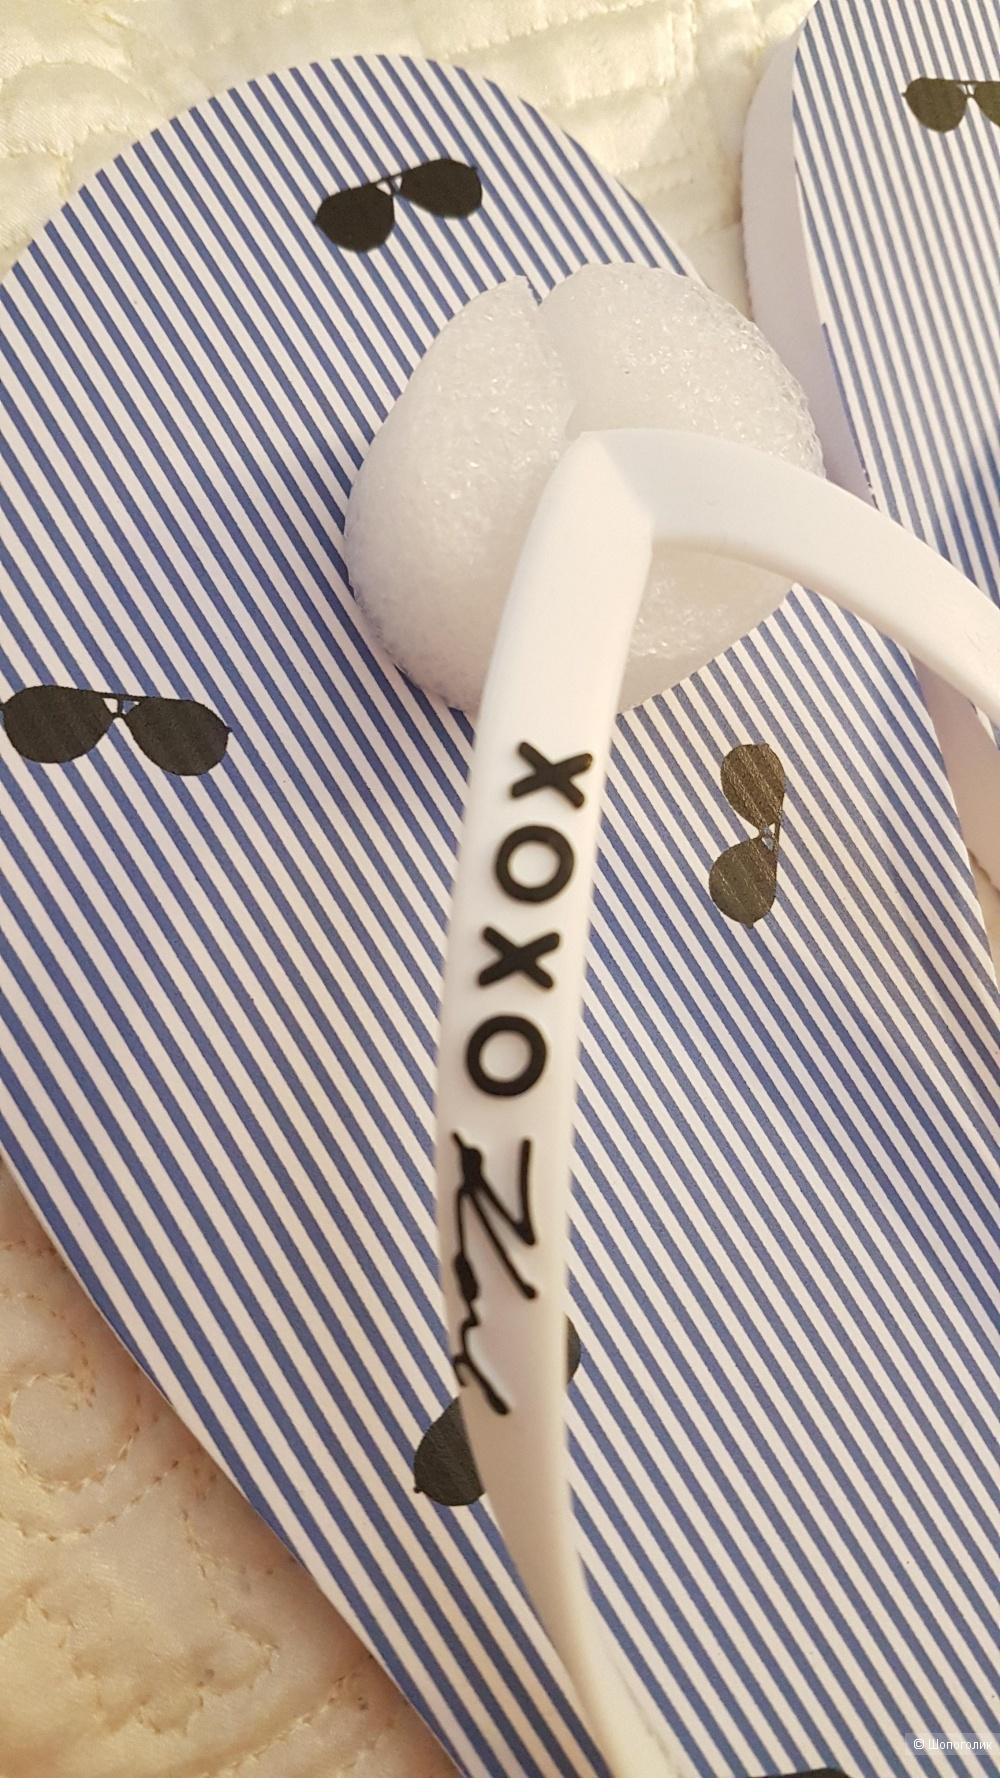 Сланцы Karl Lagerfeld , размер 41